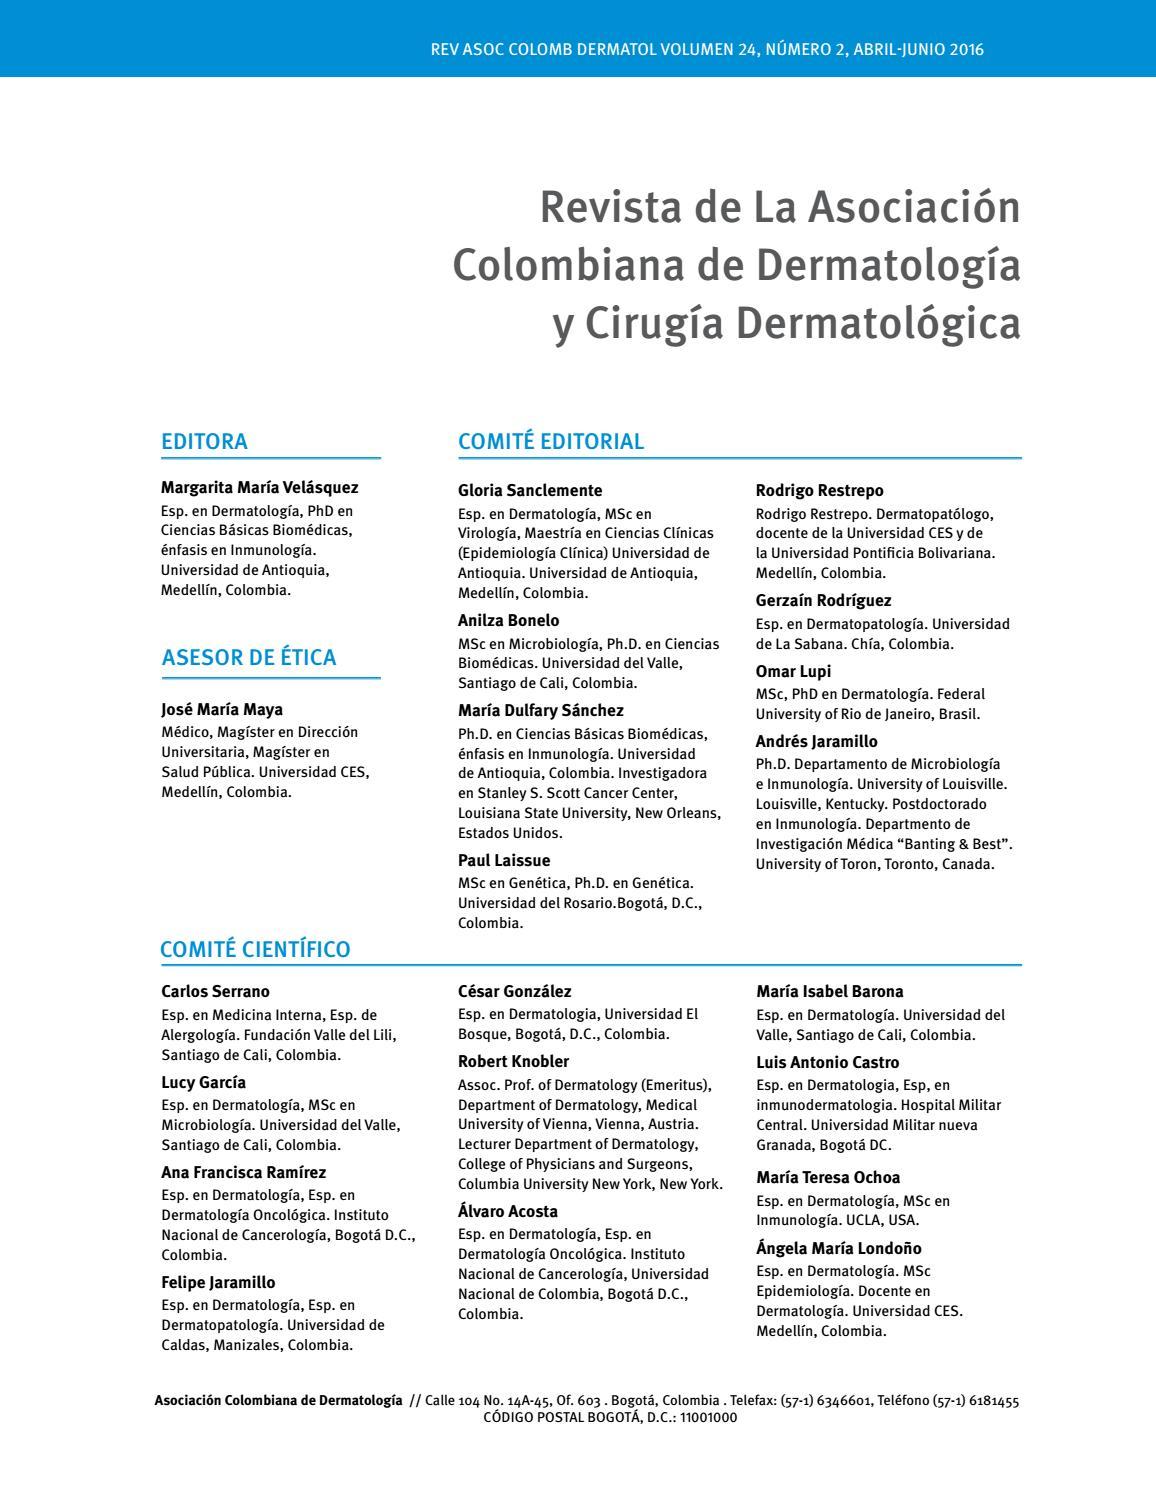 Volumen 24, número 2 junio agosto 2016 by revista asocolderma - issuu